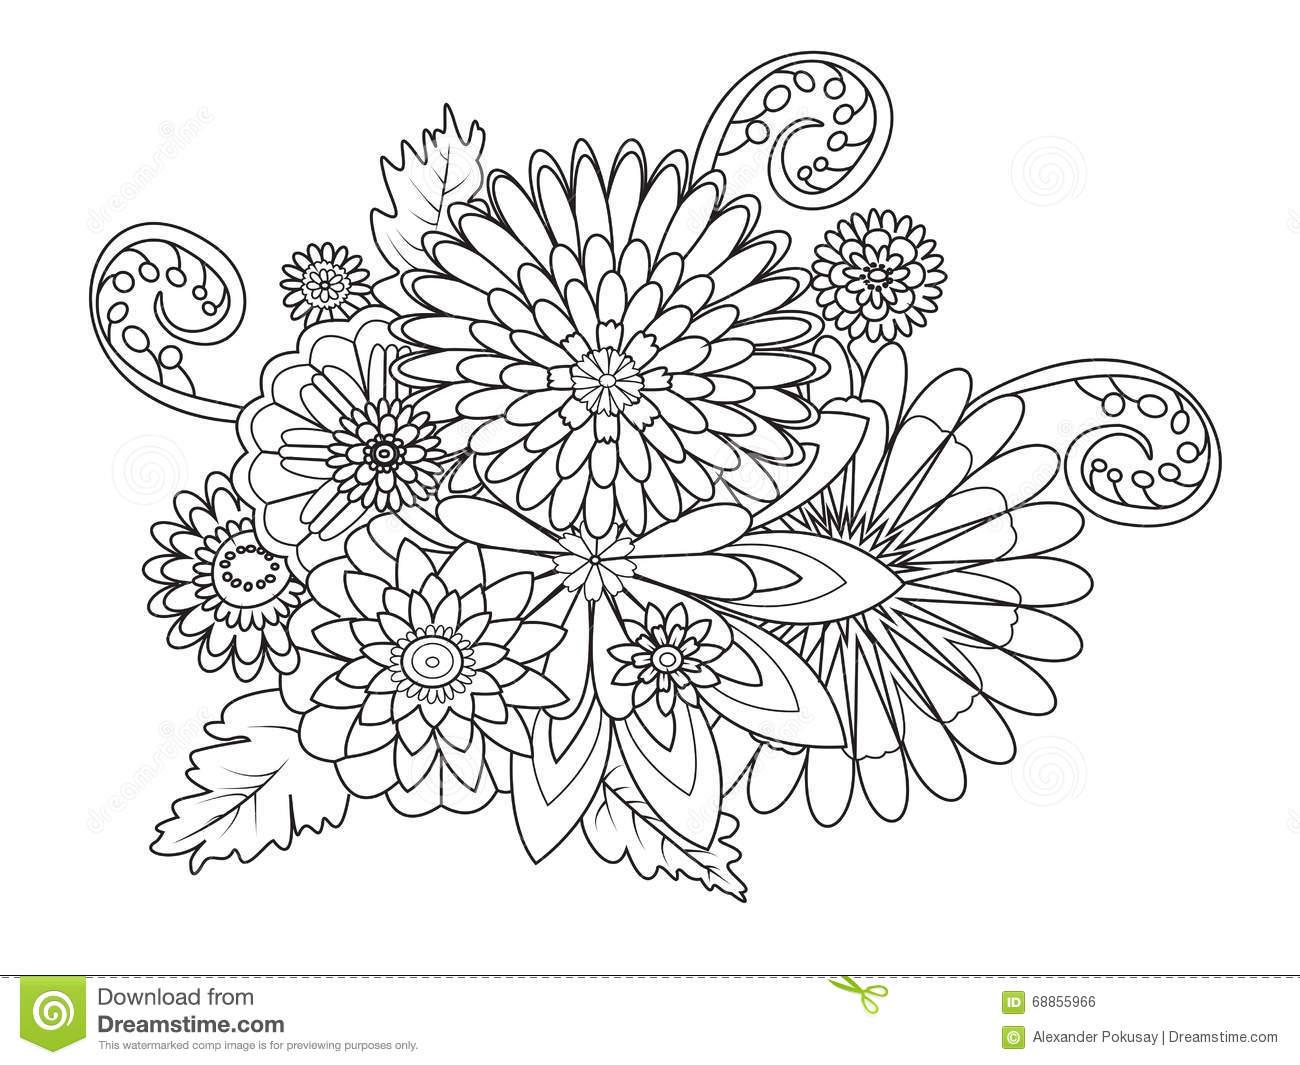 Livro Para Colorir Do Ornamento Das Flores O Vetor Dos Adultos On